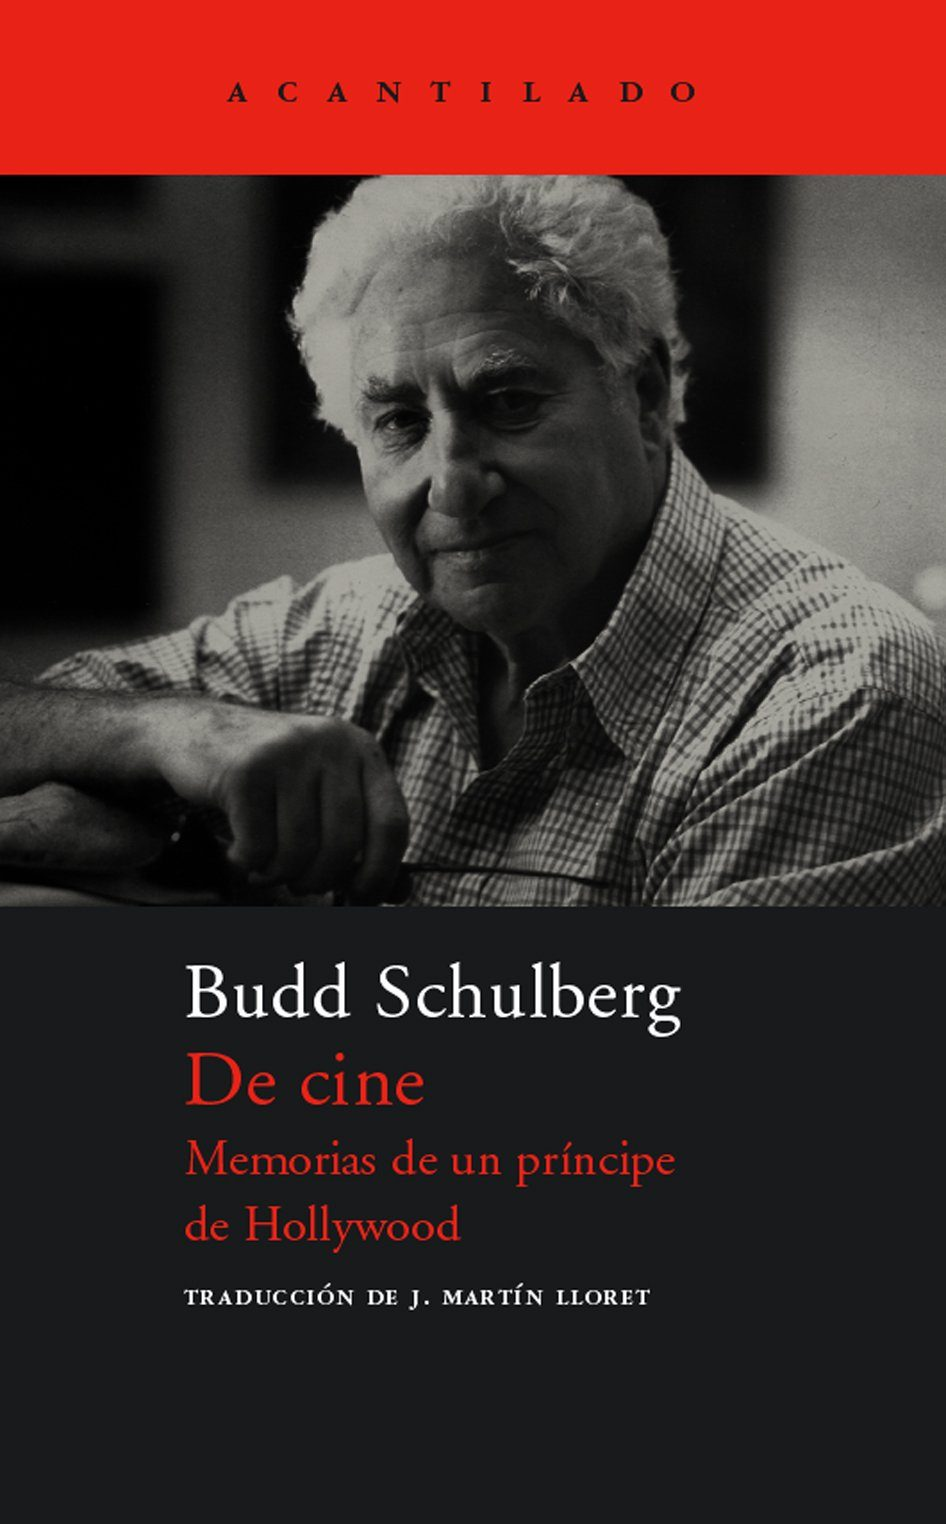 De Cine: Memorias De Un Príncipe De Hollywood por Budd Schulberg